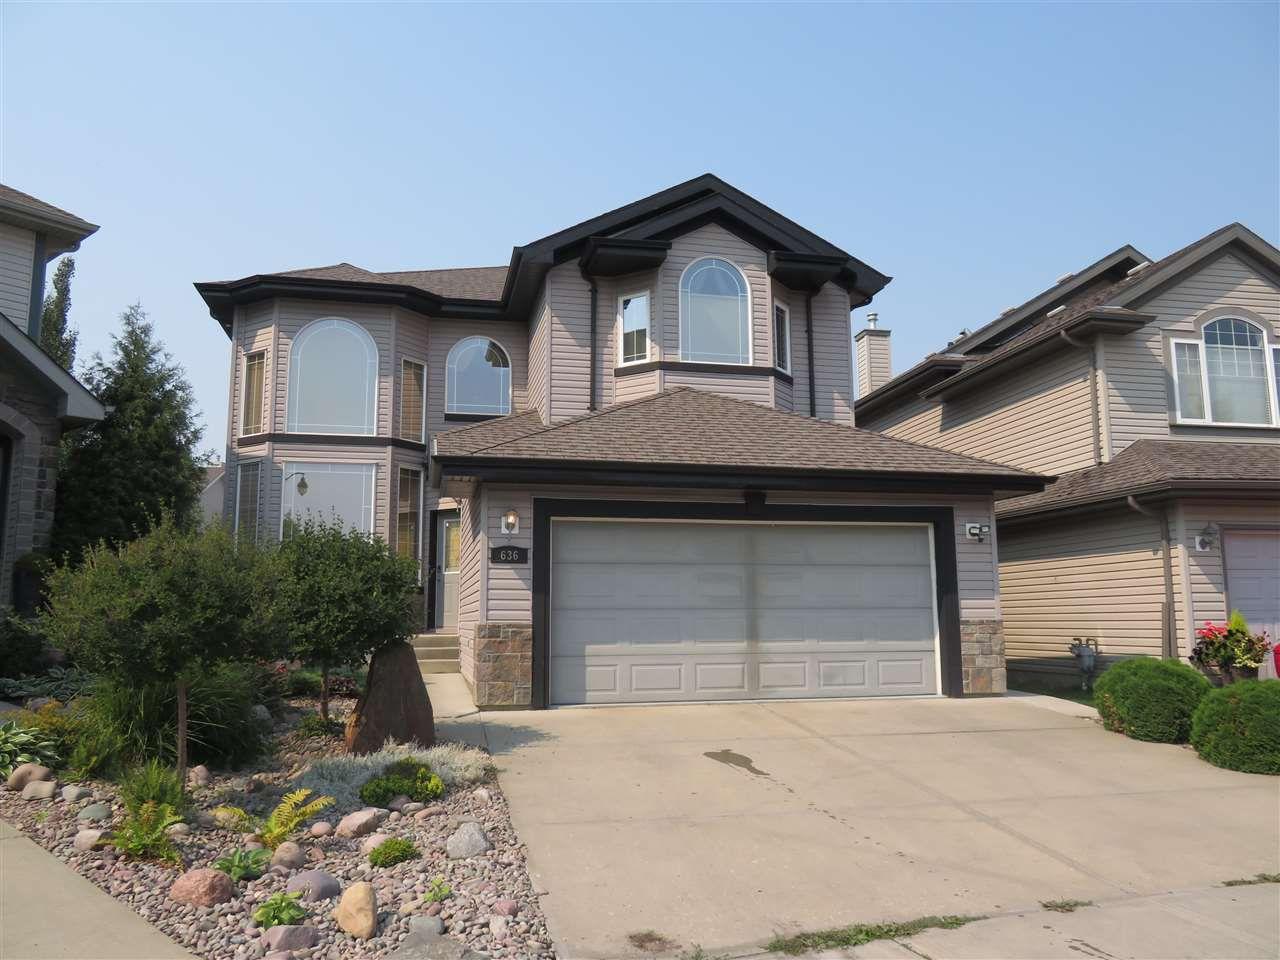 Main Photo: 636 HODGSON Road in Edmonton: Zone 14 House for sale : MLS®# E4129242